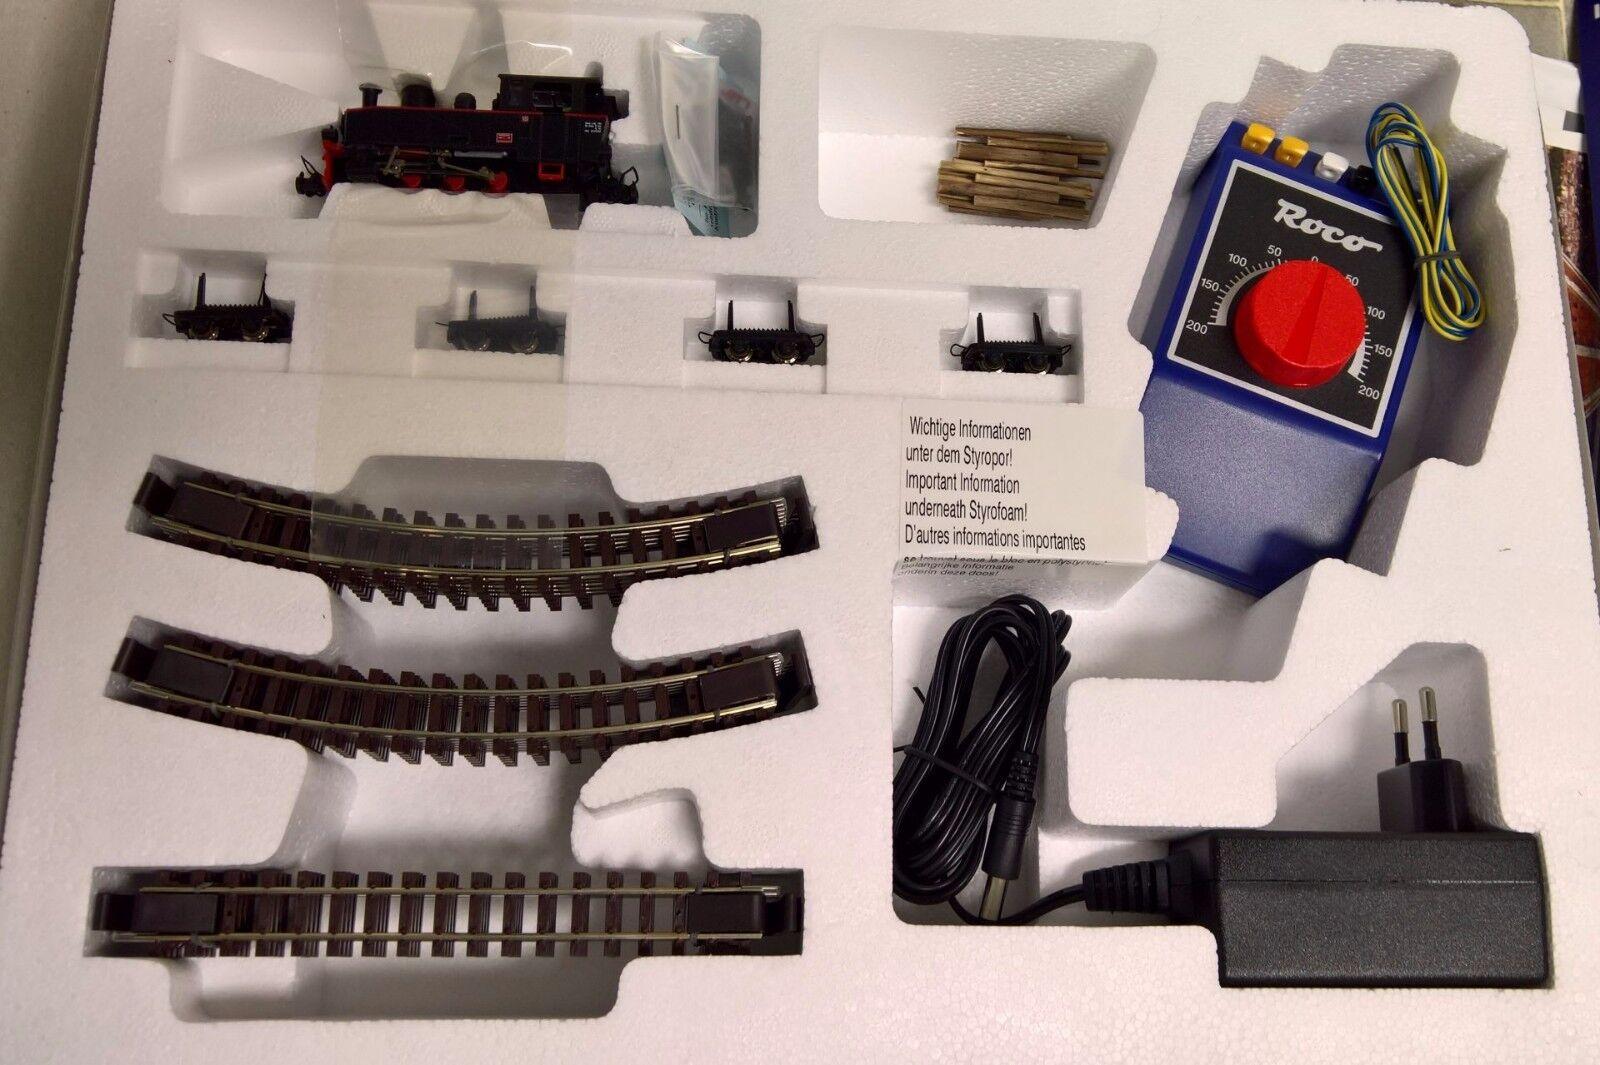 ROCO 31030 analogico Starter Set: locomotiva a vapore con holzzug traccia h0e NUOVO